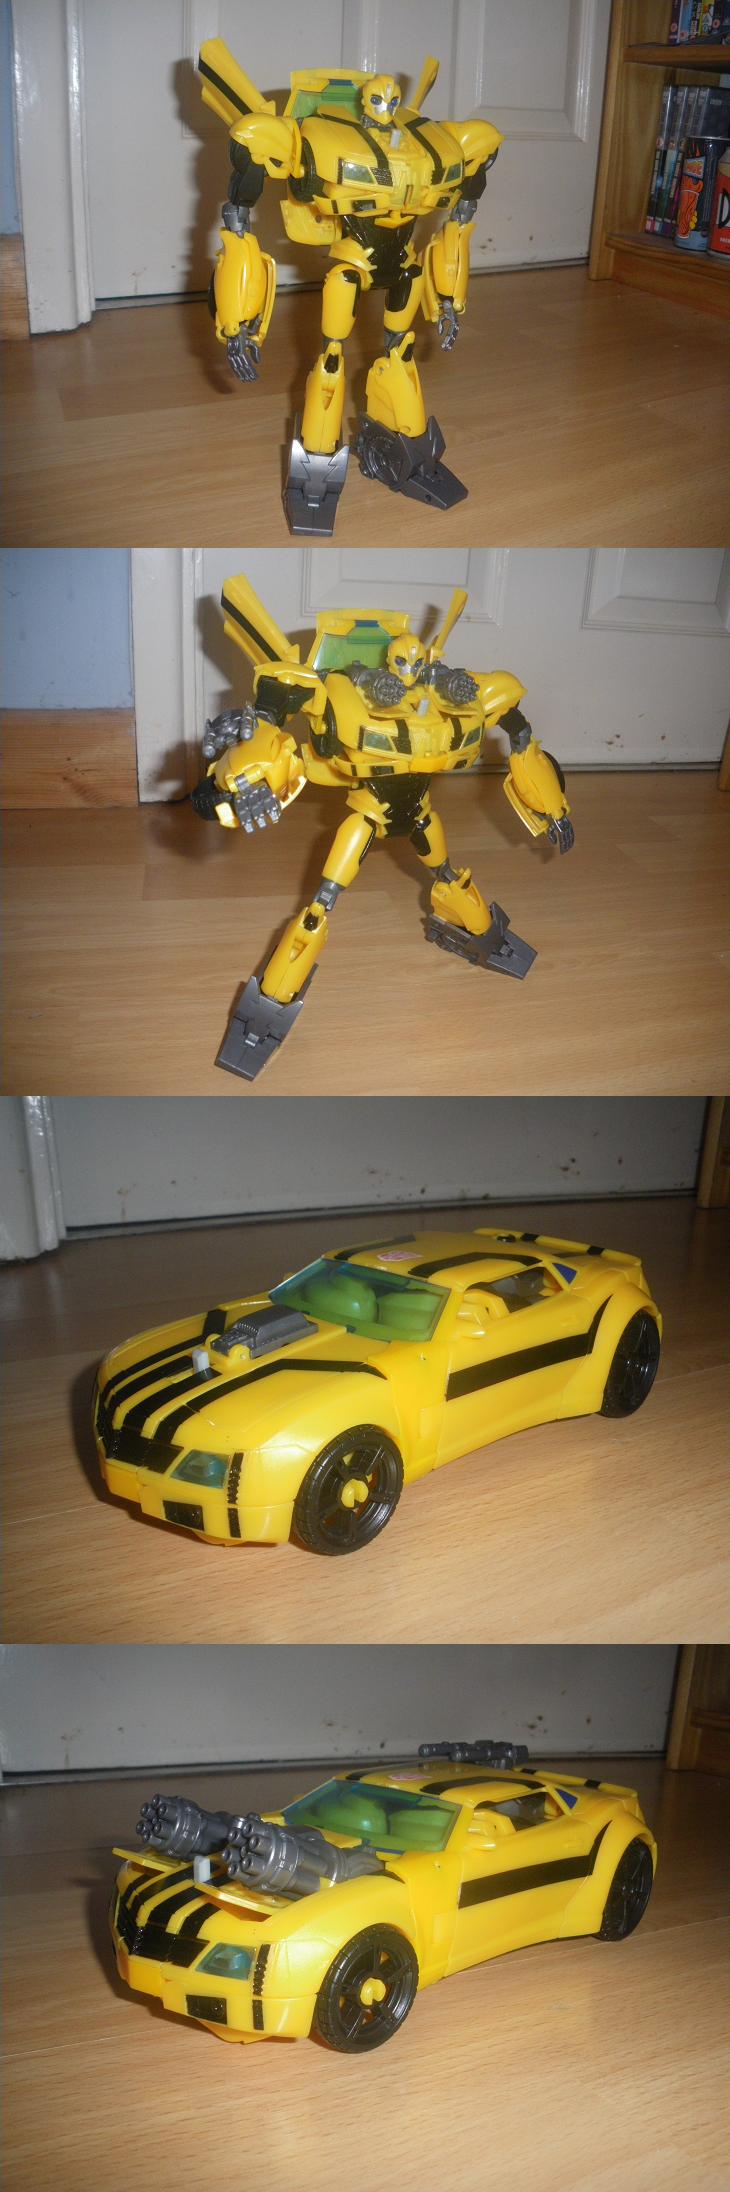 TFP Weaponizer - Bumblebee by KrytenMarkGen-0